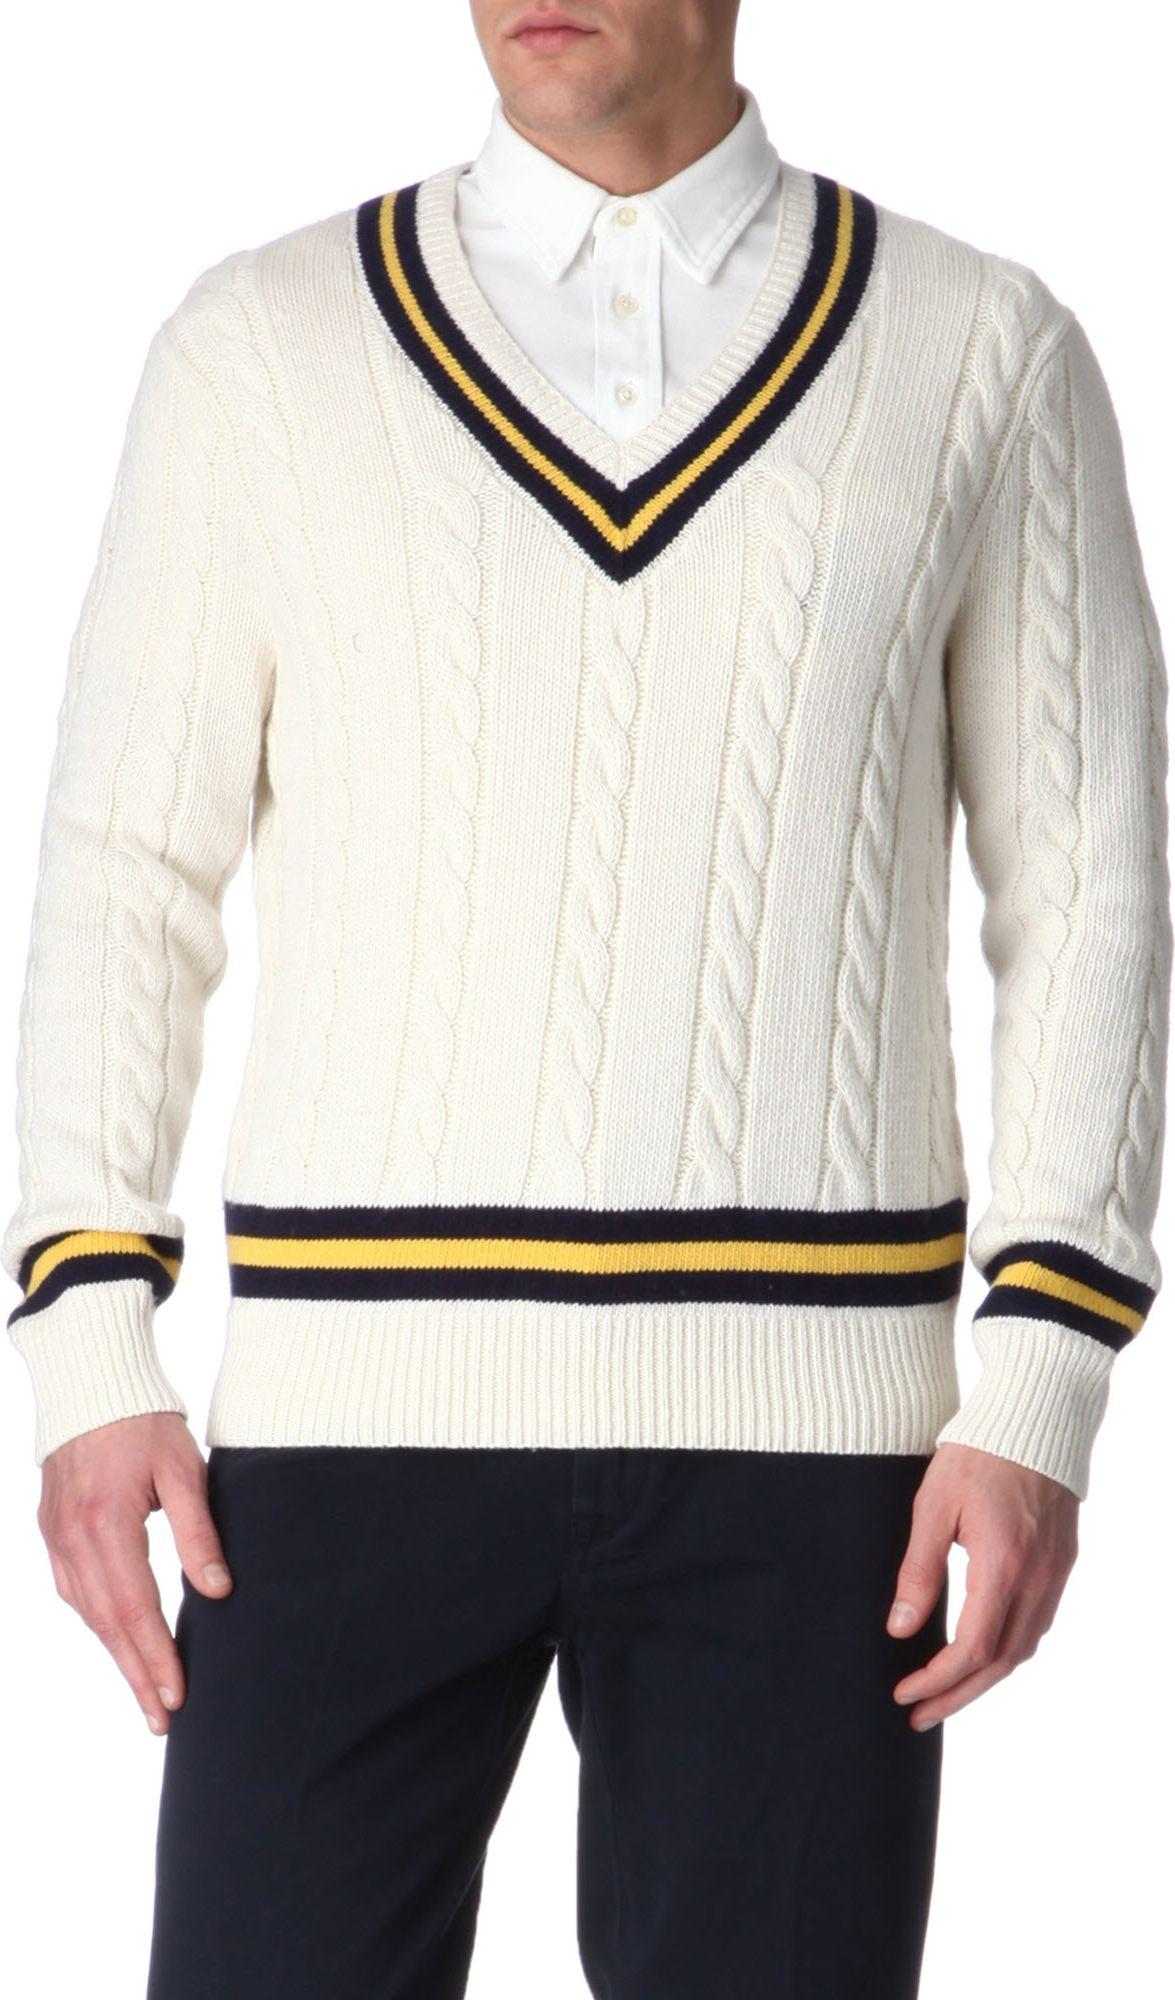 Ralph Lauren Cricket Cableknit Jumper In White For Men